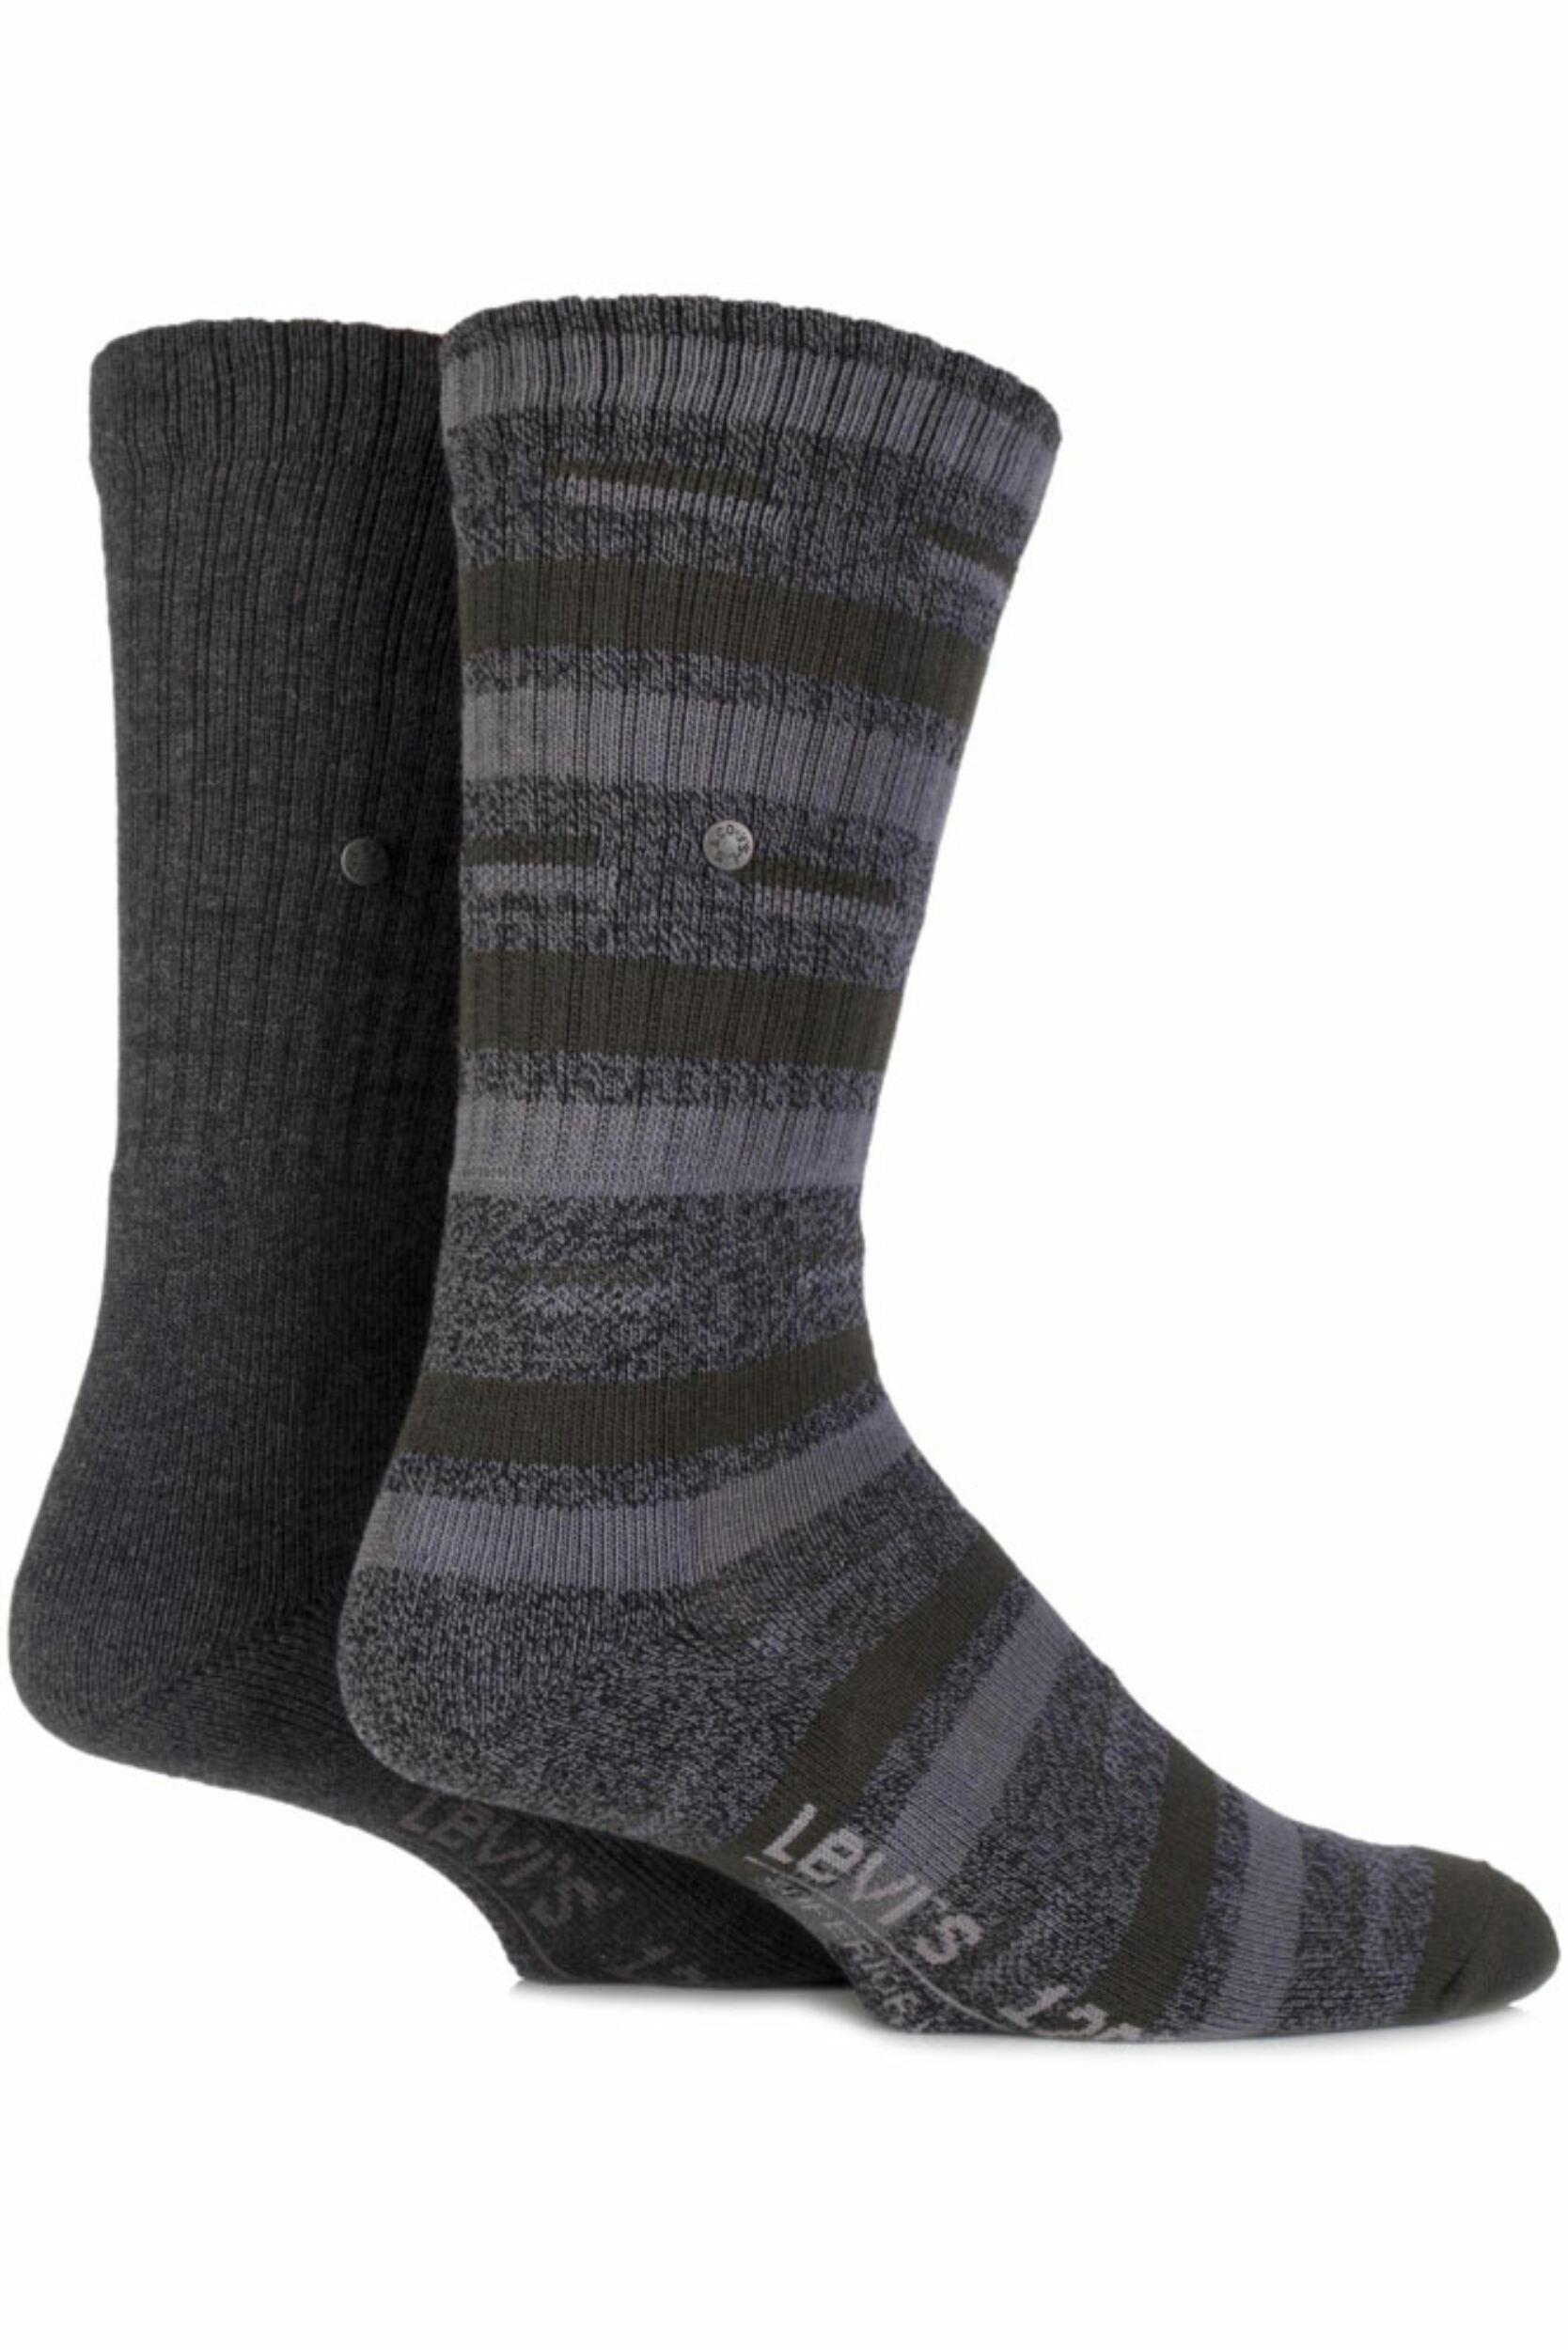 Image of Mens 2 Pair Levis 120SF Classic Rib Striped and Plain Cushioned Socks